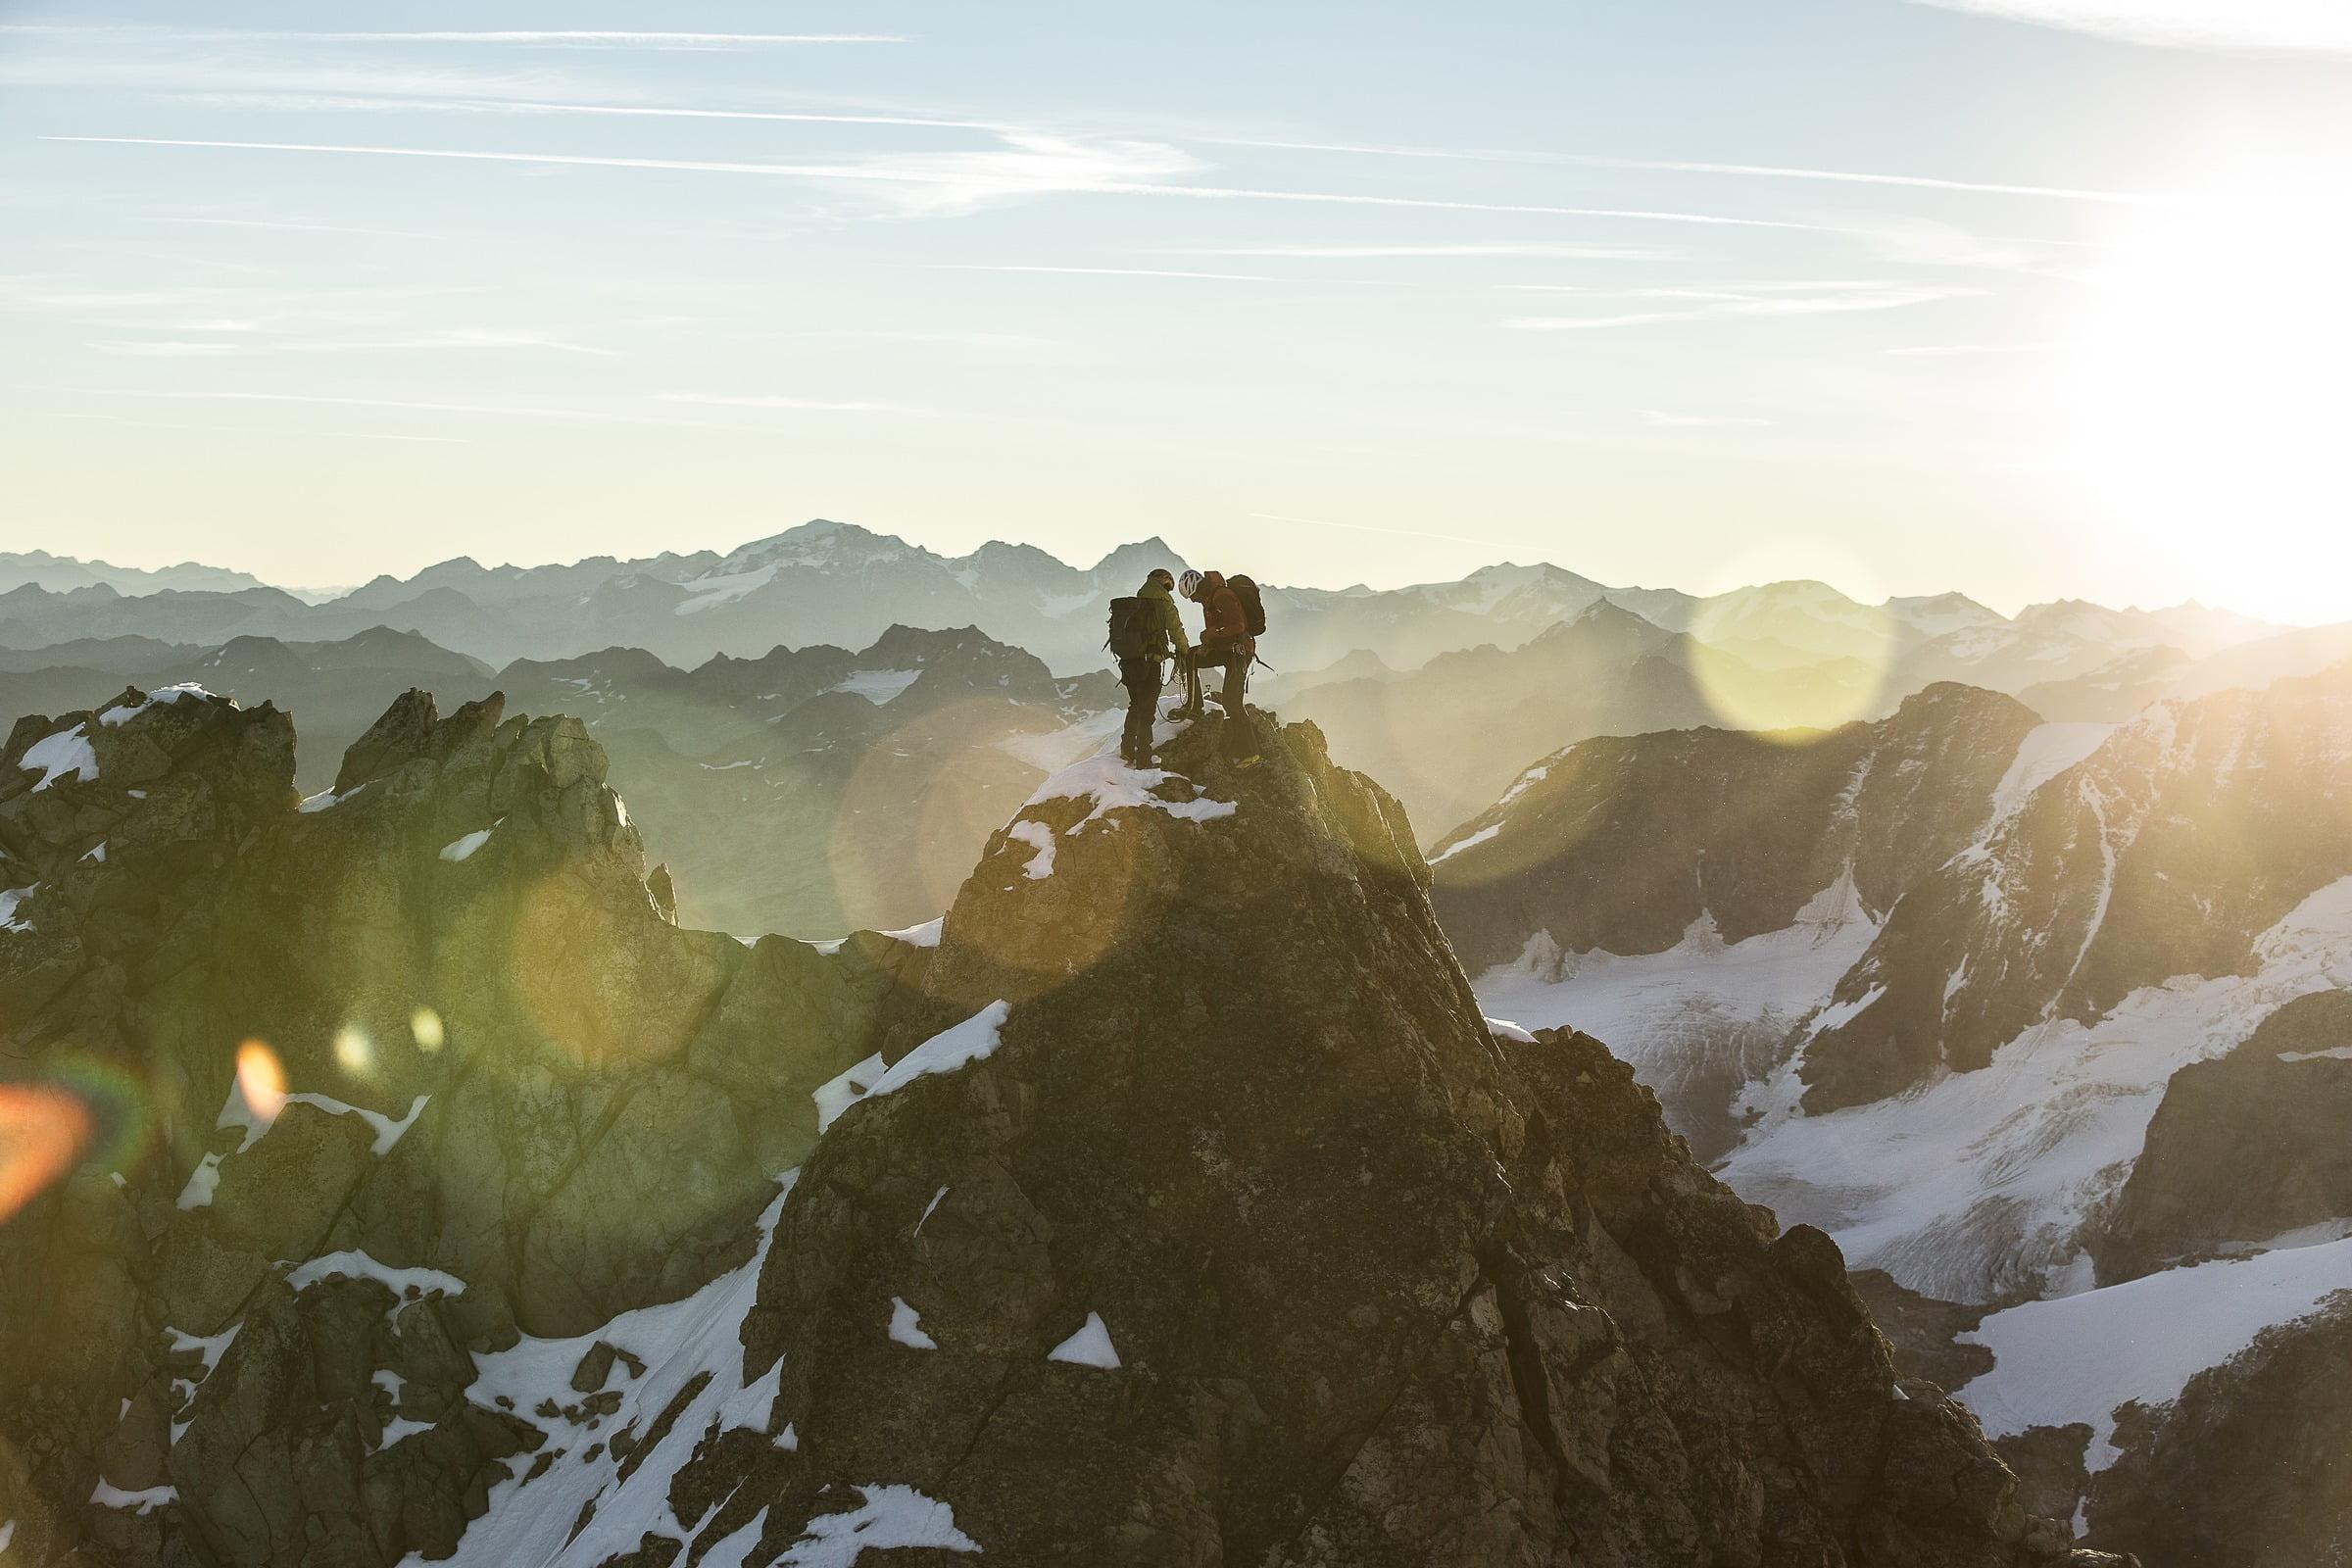 Climbing Piz Bernina 4049 m